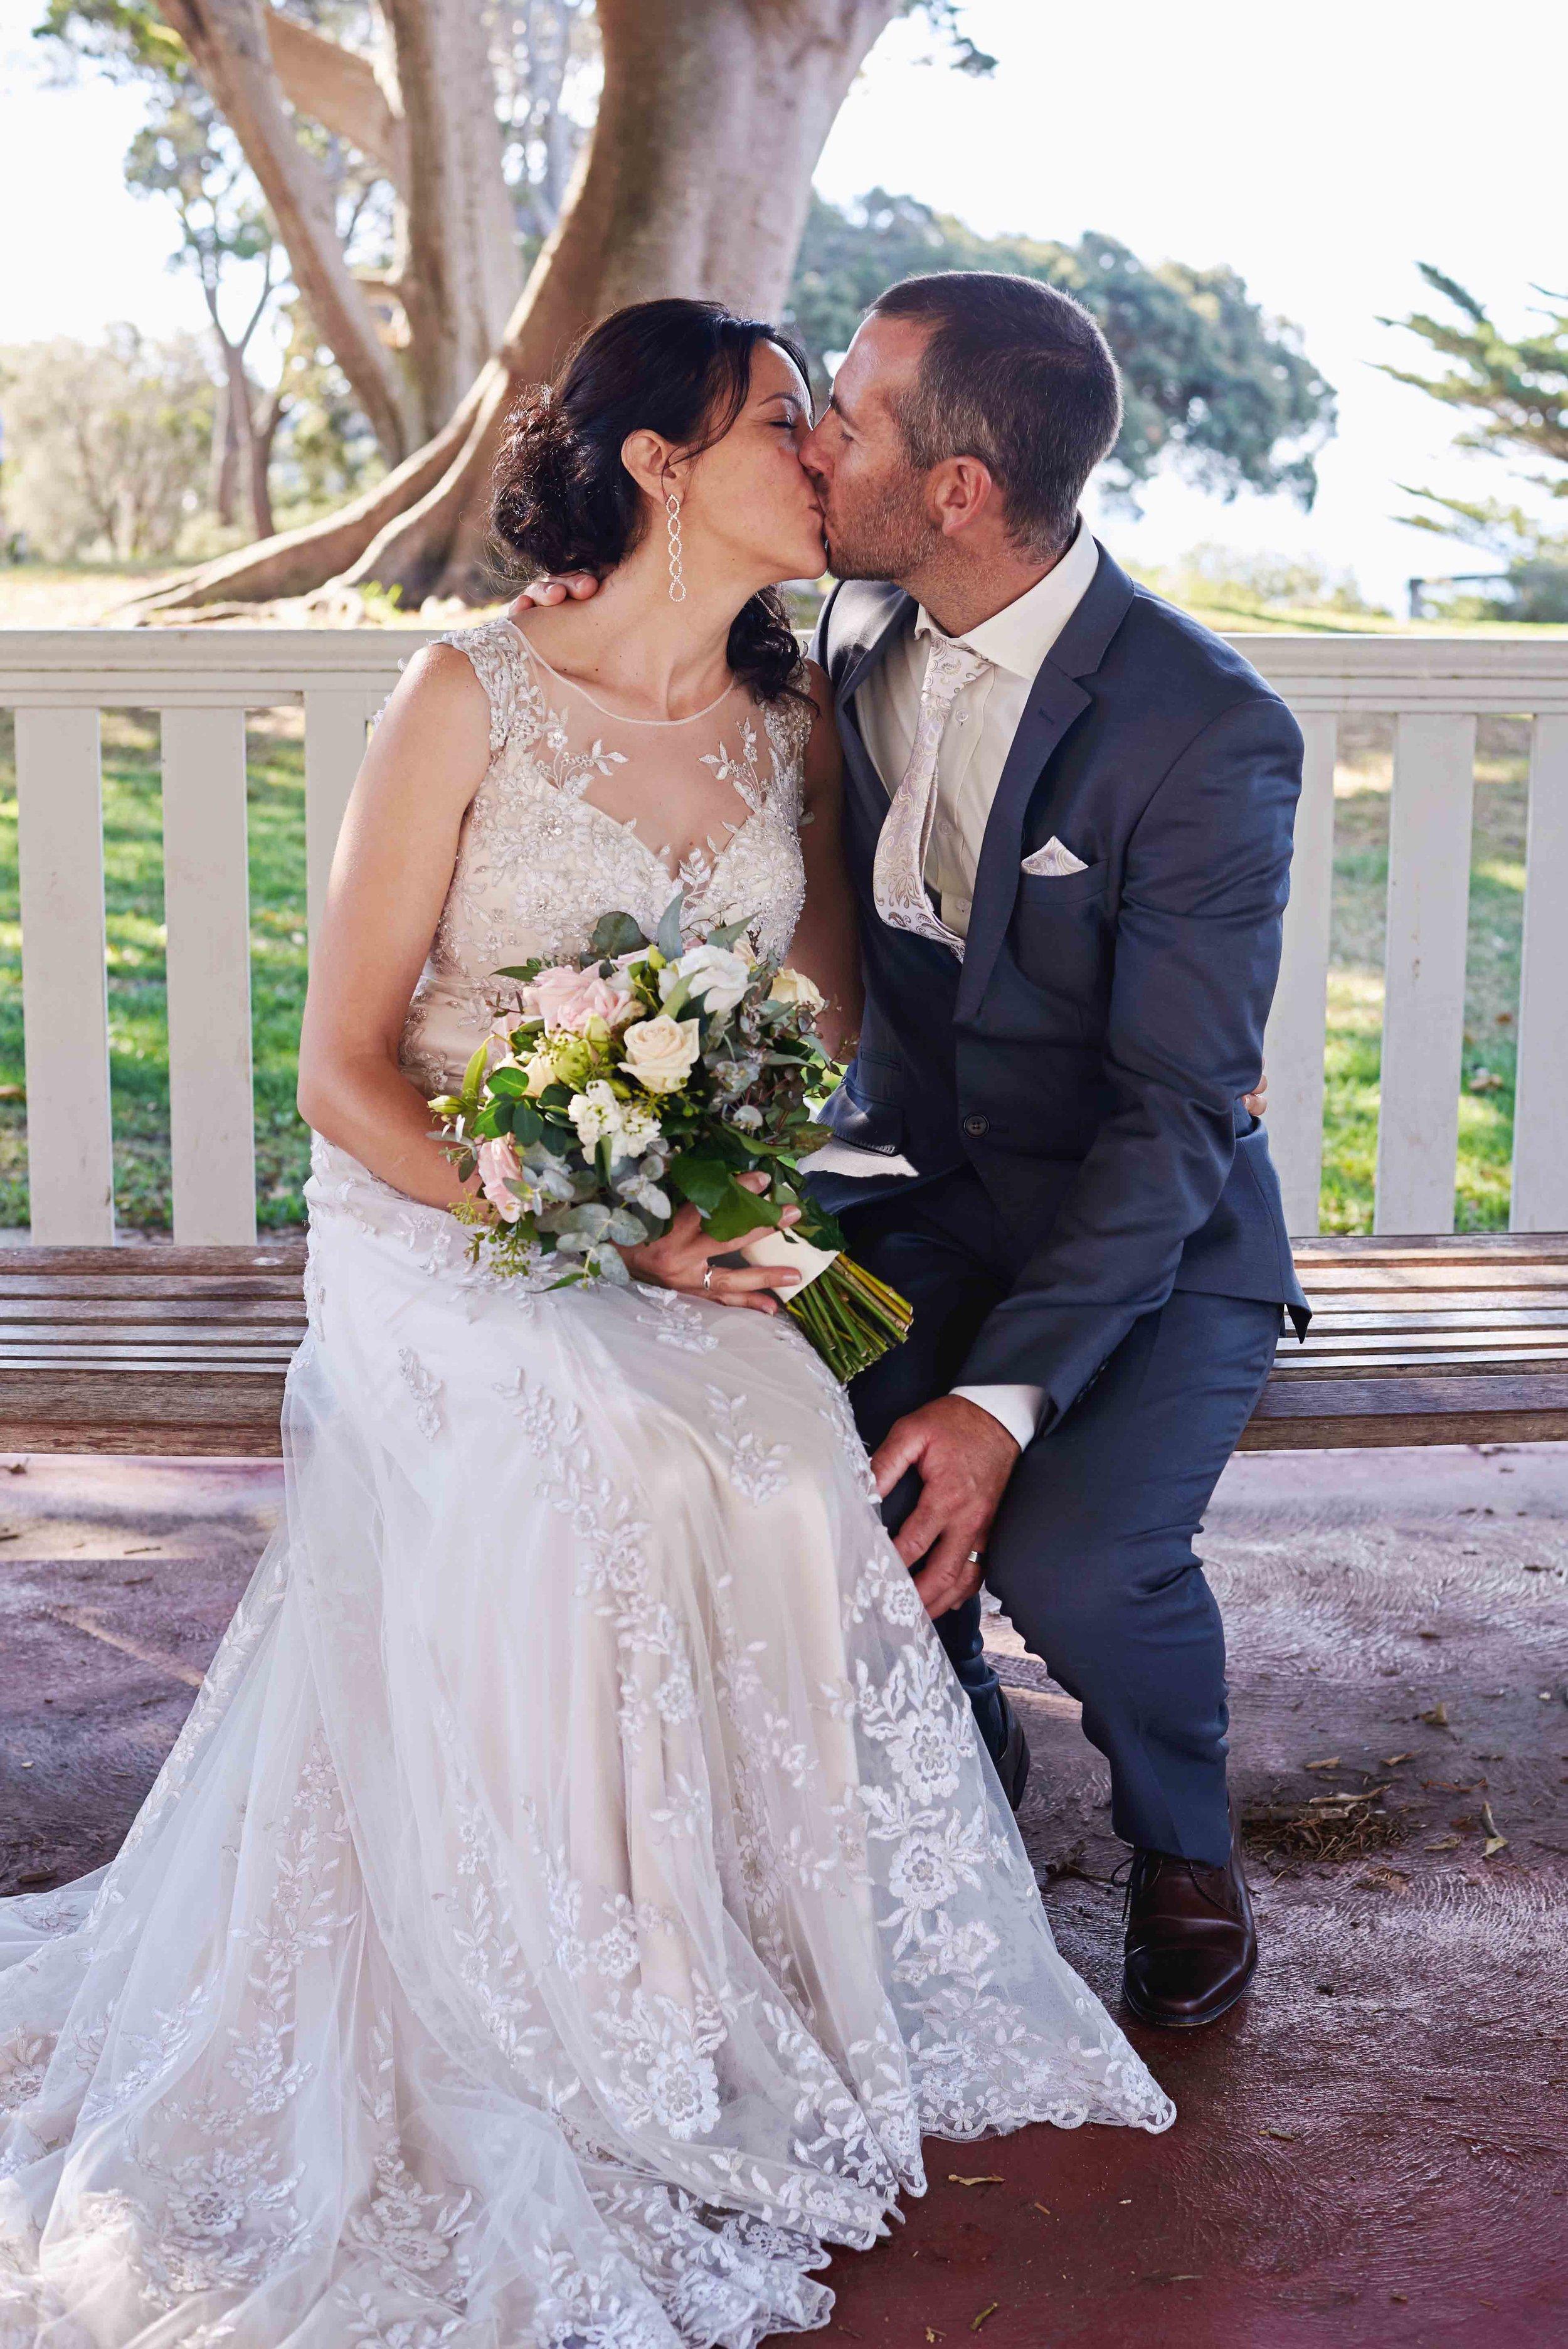 sorrento-wedding-photography-all-smiles-marissa-jade-photography-151.jpg